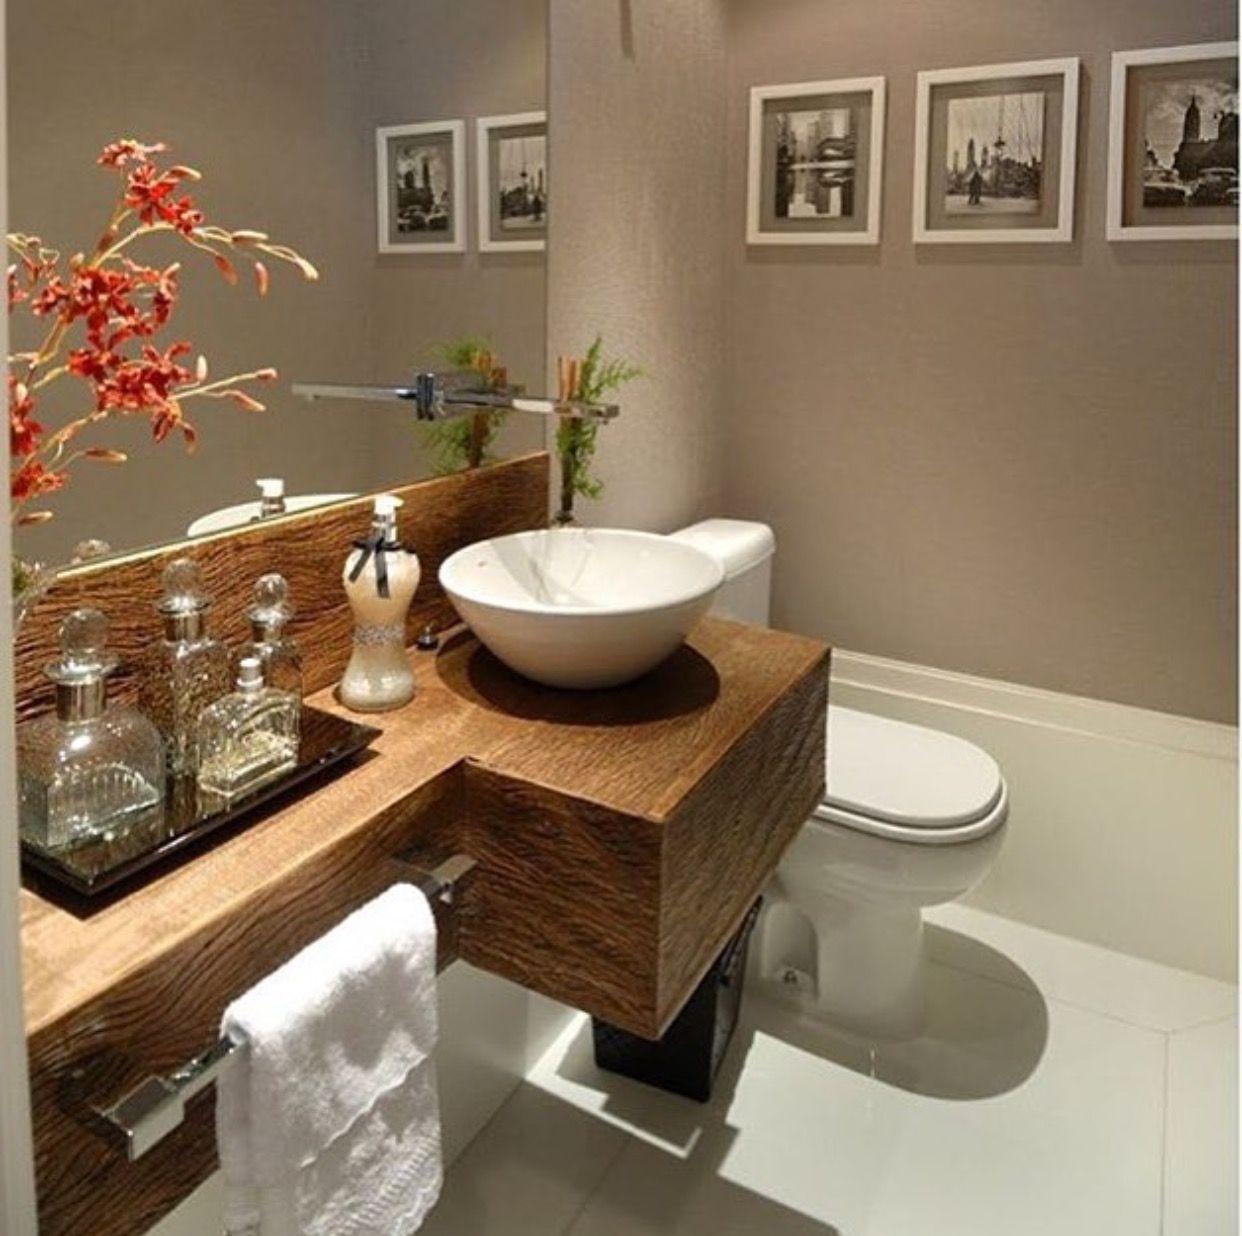 Decorative Hand Towels For Powder Room Pin By Carine Sebben On Ideias Para A Casa Pinterest